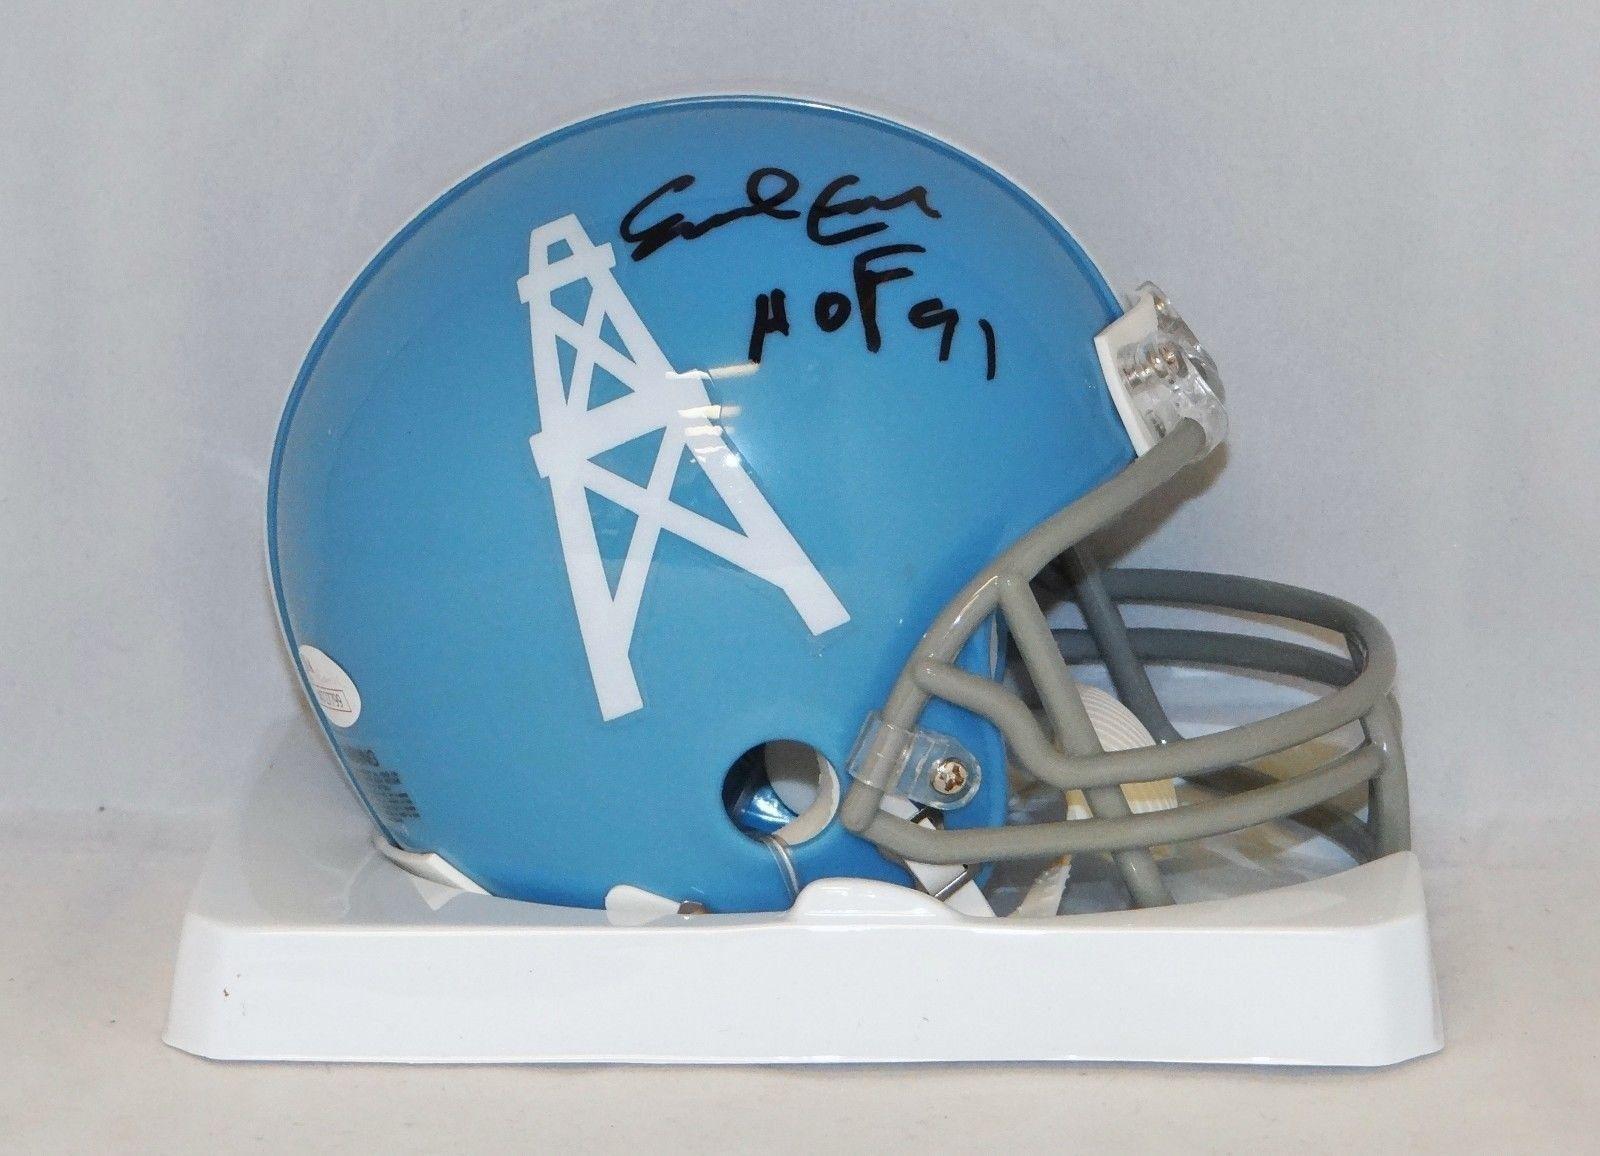 Earl Campbell Signed Mini Helmet 60 62 TB W HOF W Auth JSA Certified Autographed NFL Mini Helmets